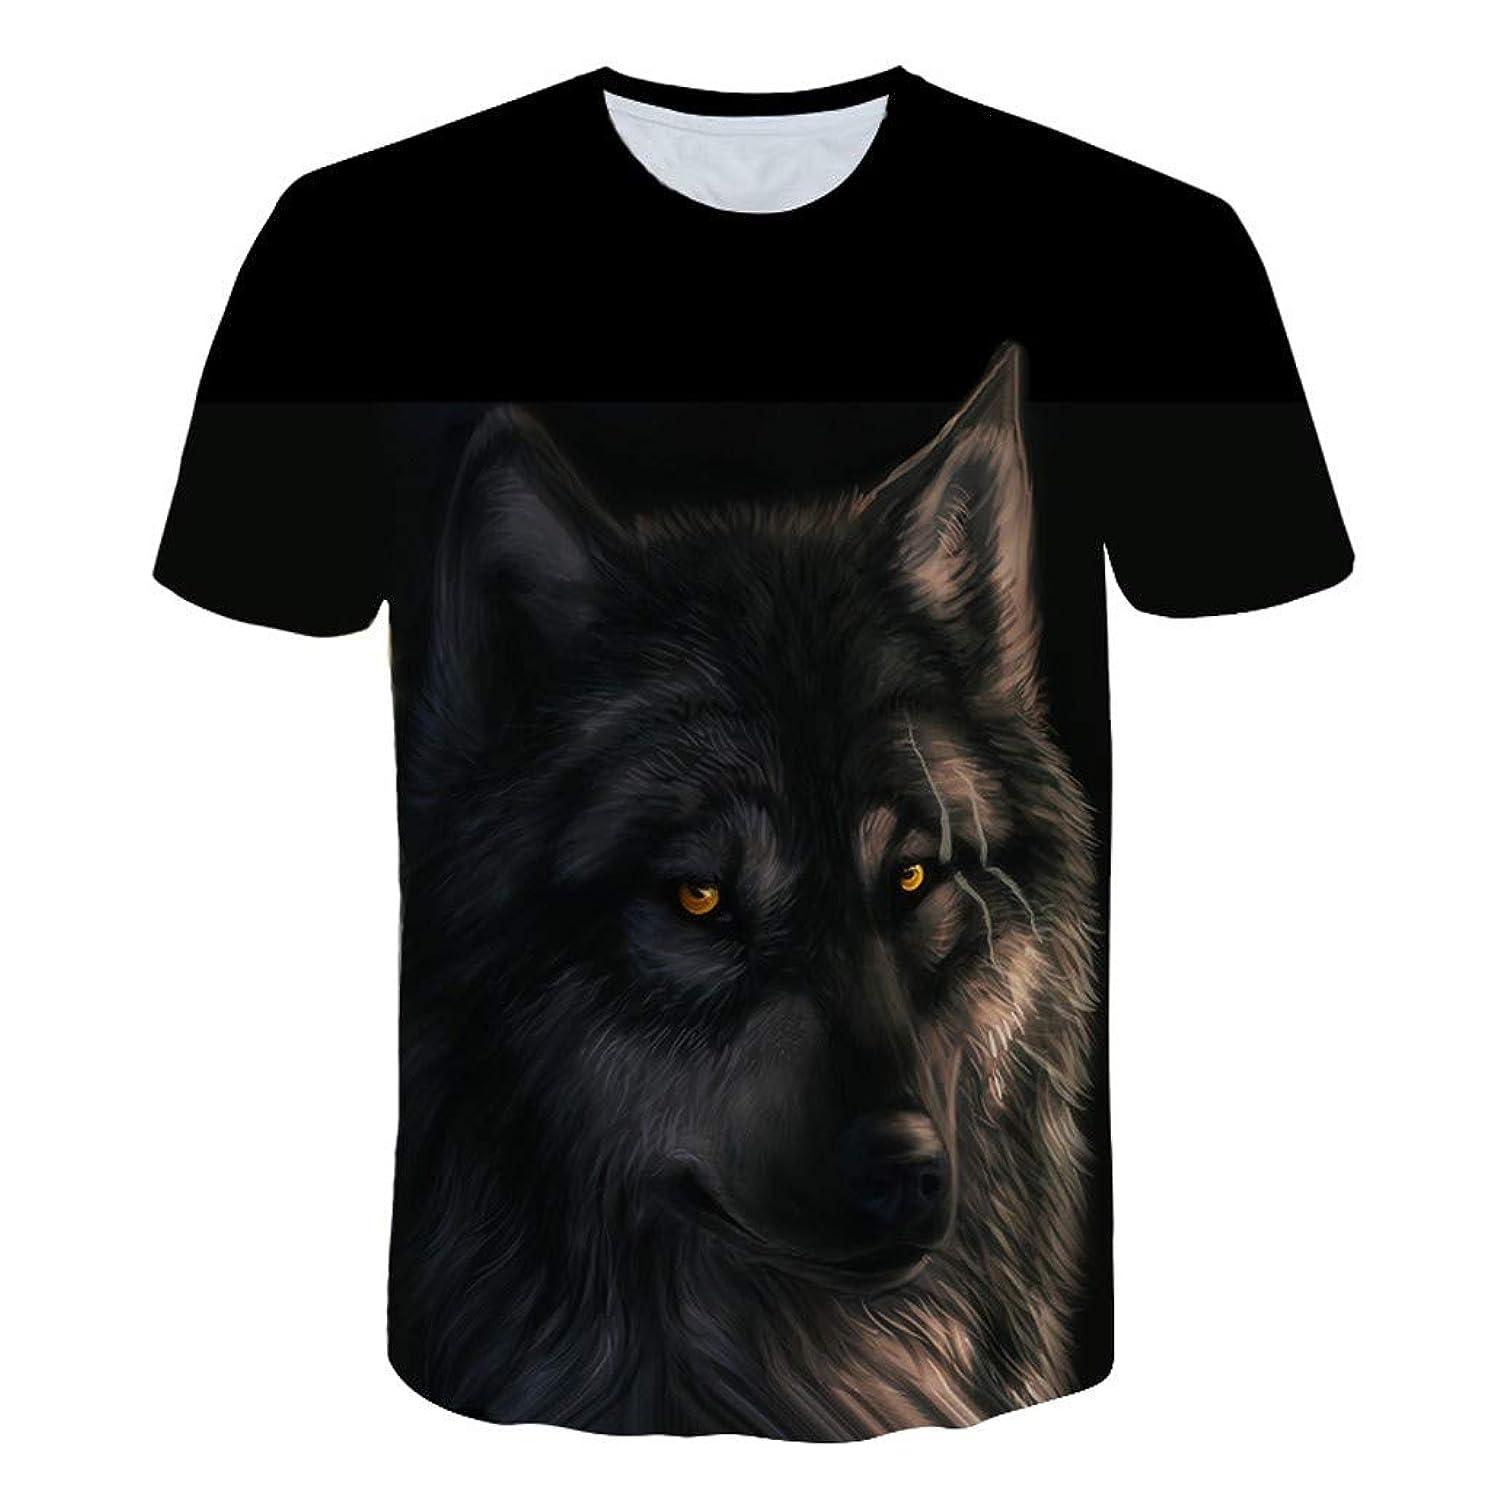 JJLIKER Unisex 3D Print T-Shirts Wolf Graphic Tees Funny Creative Short Sleeve Tops Tee for Men Women